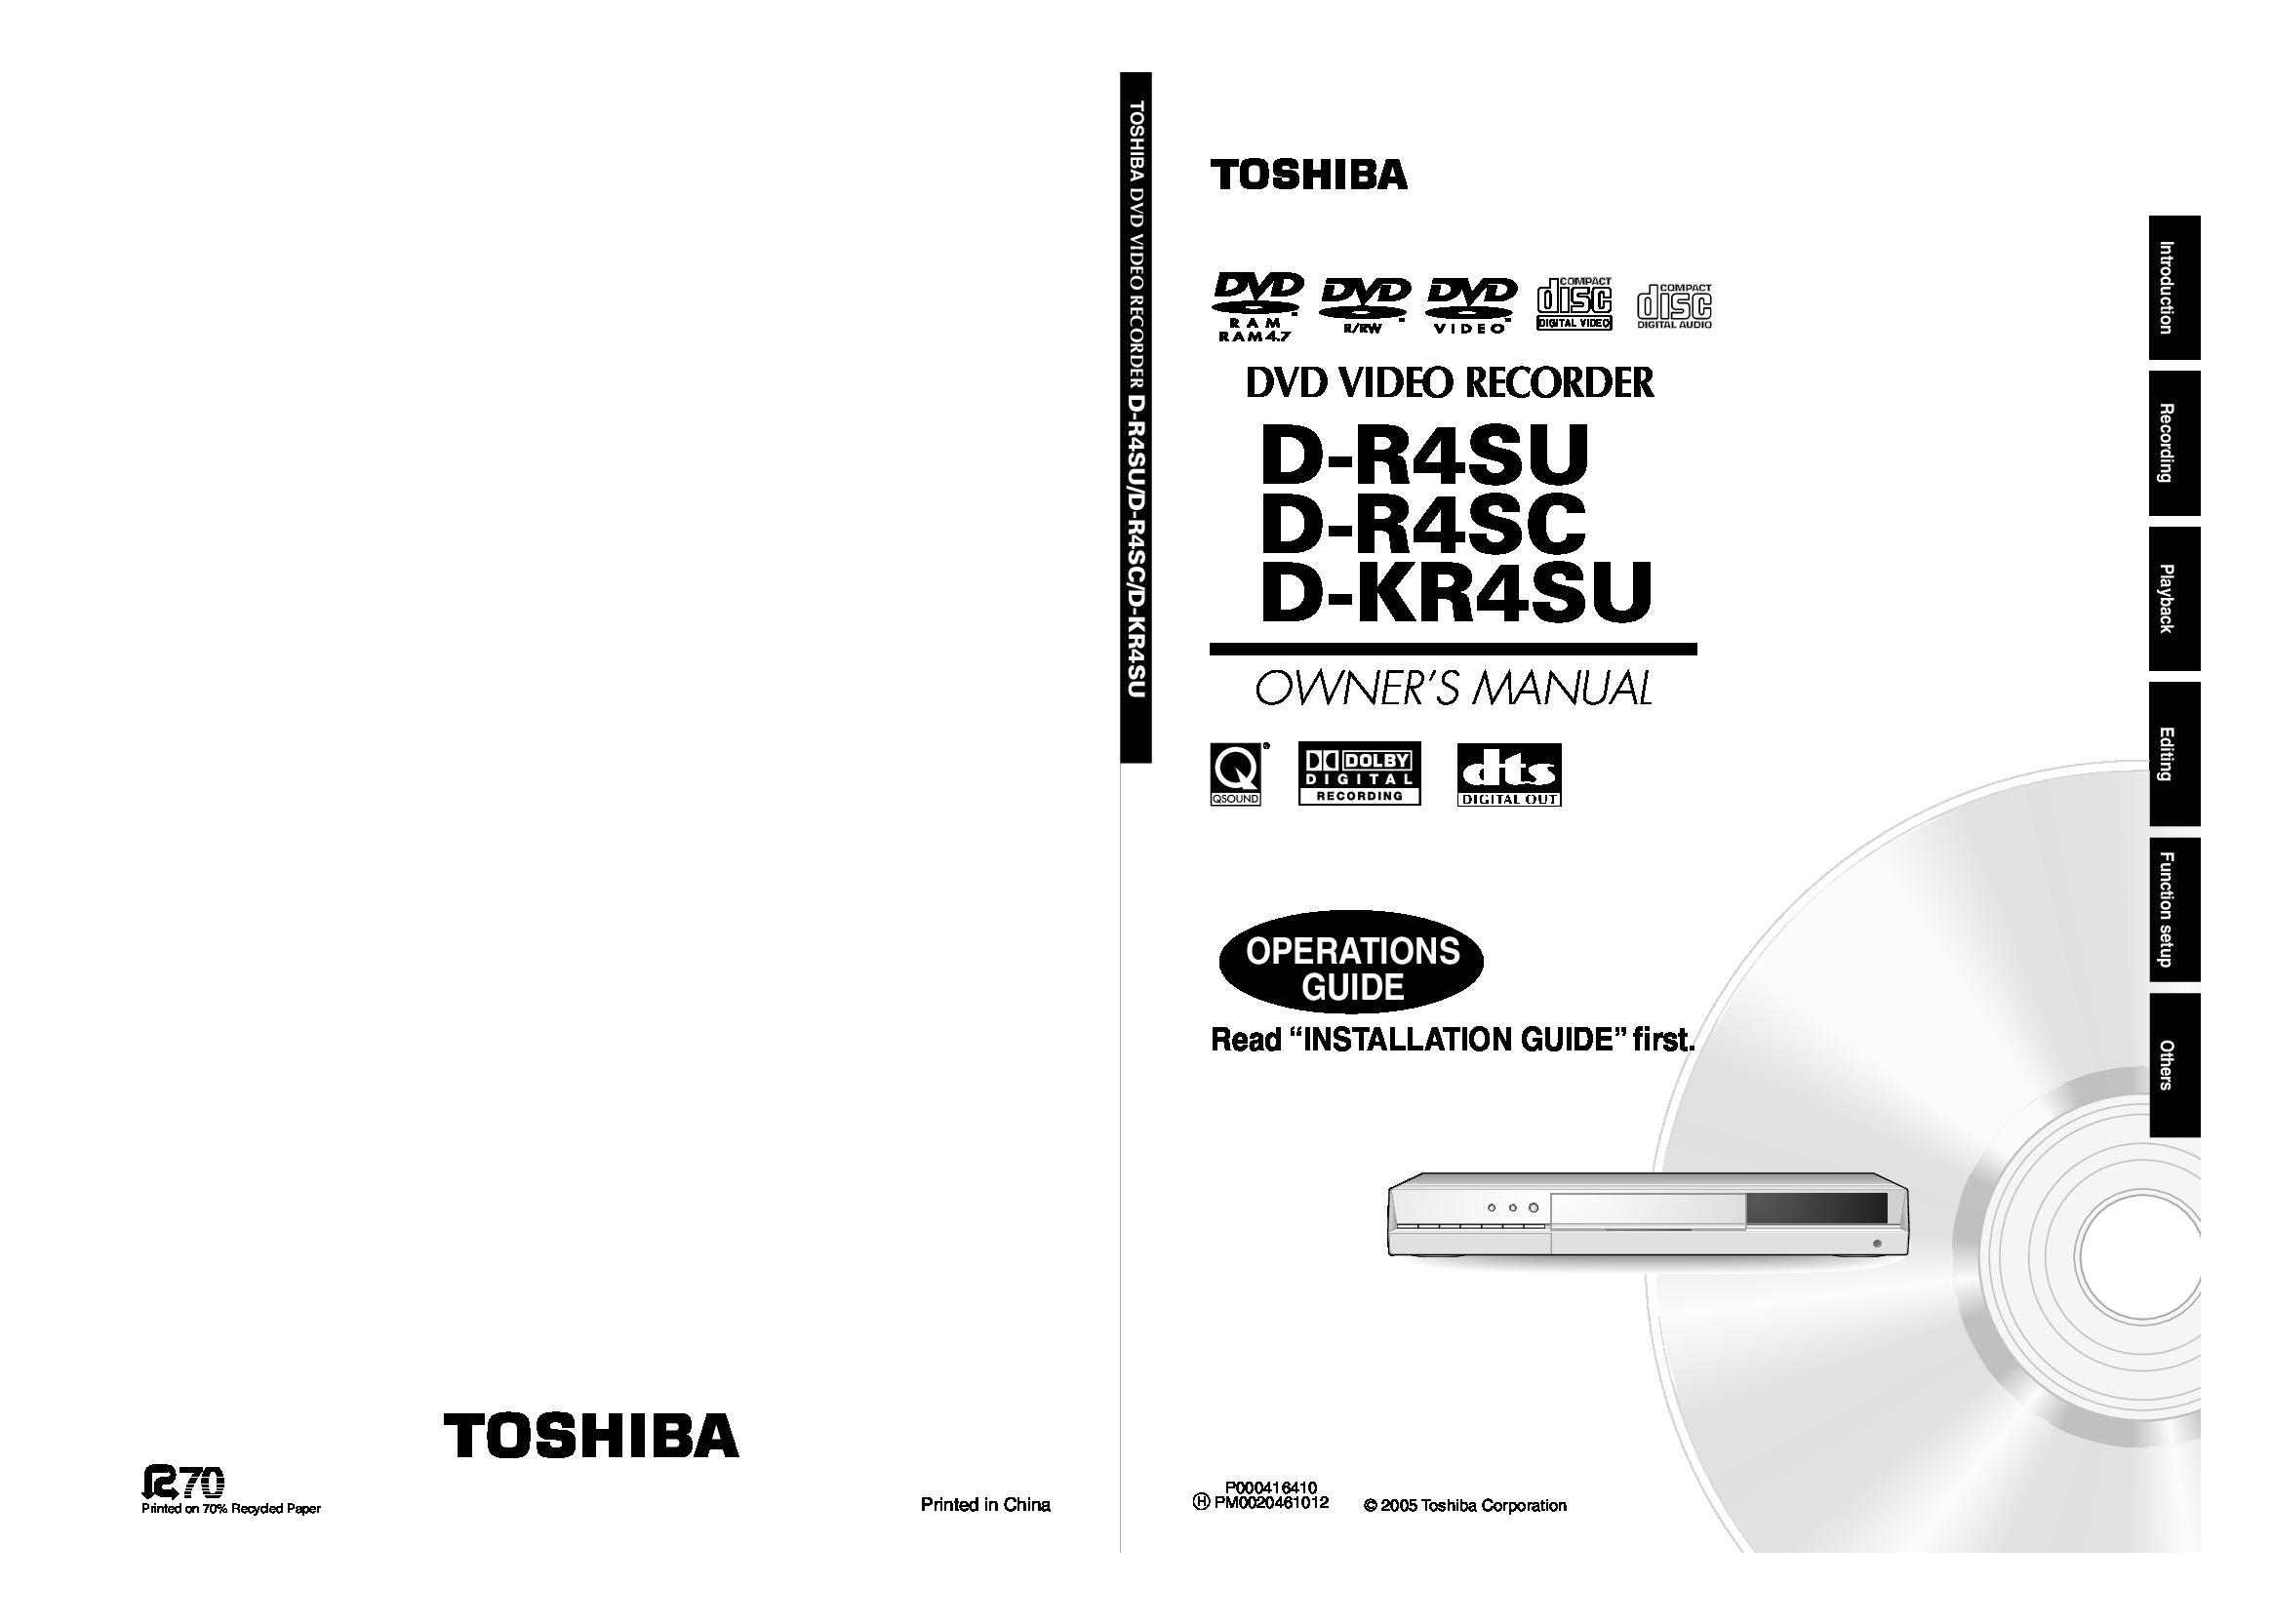 Toshiba DVD Recorder manuals